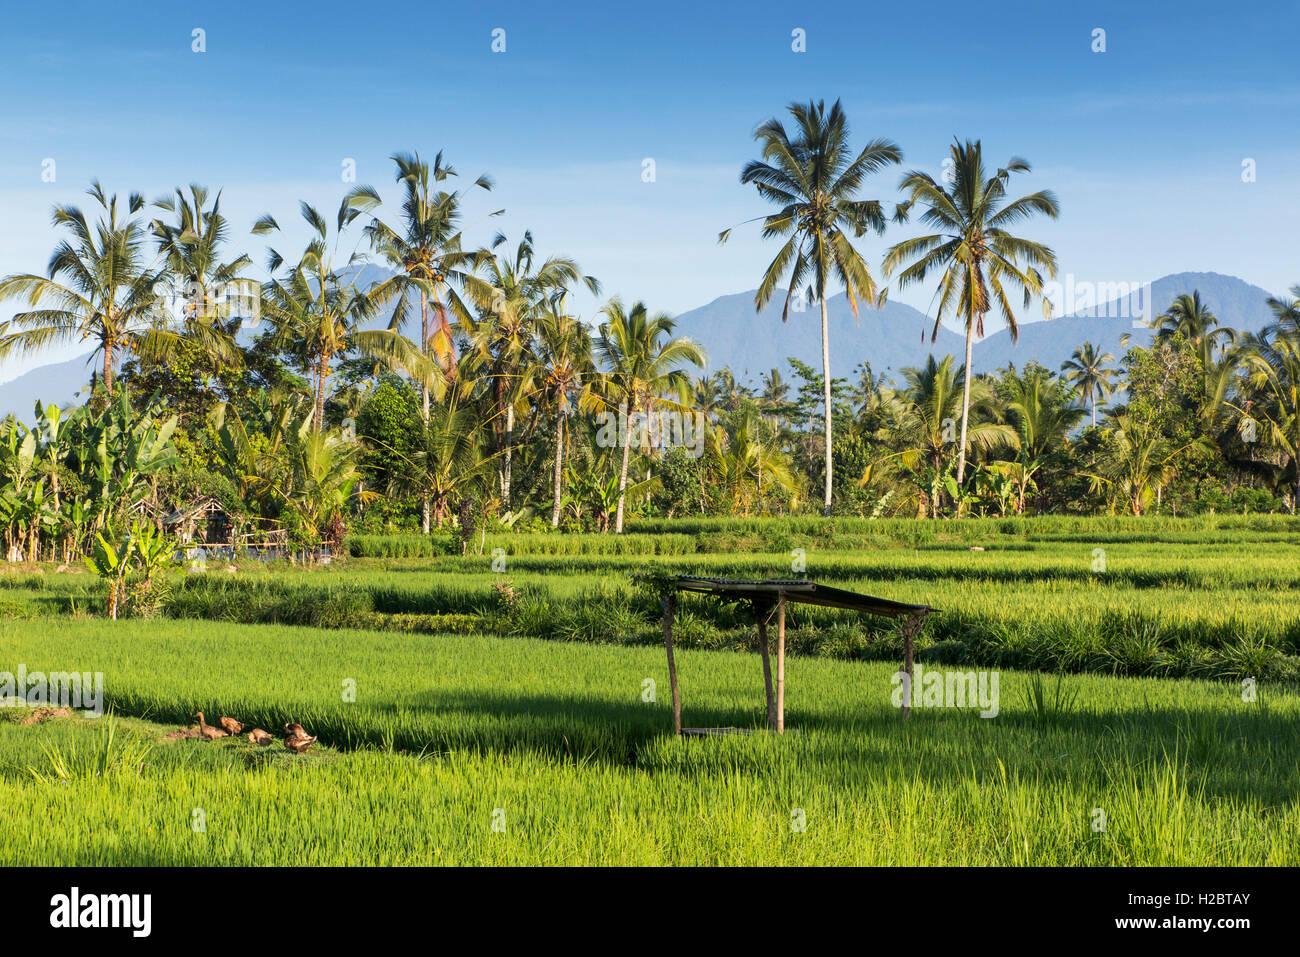 Indonesia, Bali, Payangan, Susut, rice fields wih western volcanoes in distance - Stock Image